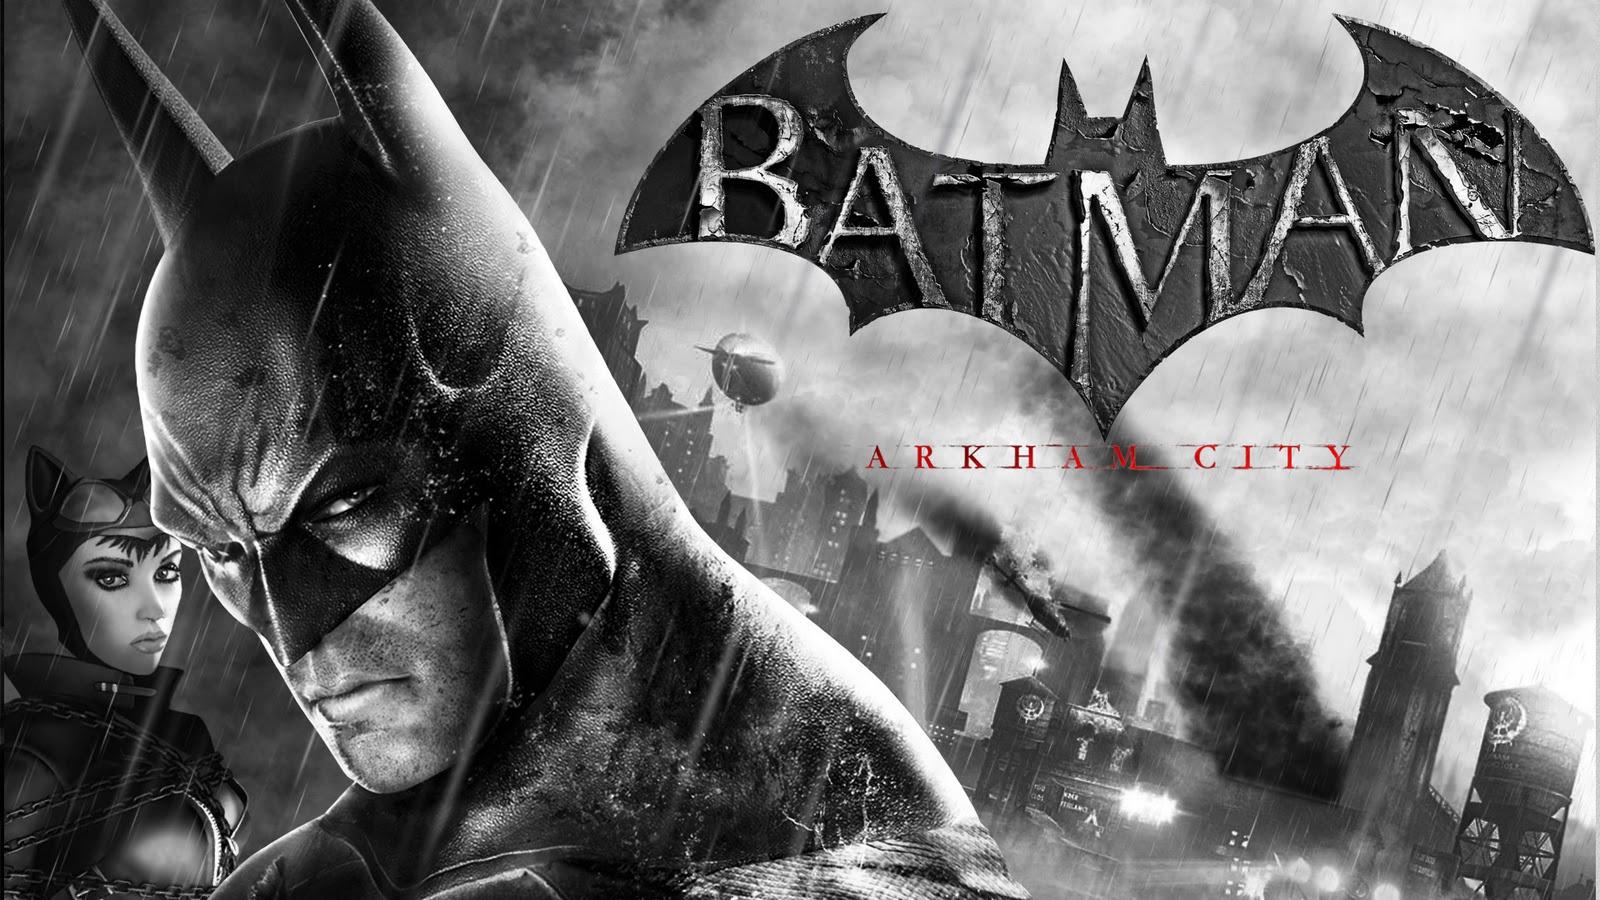 http://4.bp.blogspot.com/-_sYVPQogPZY/TZrZ9S4st1I/AAAAAAAAKS0/KLUvtCe9y-E/s1600/batman-arkham-city-wallpaper-hd-1080p.jpg